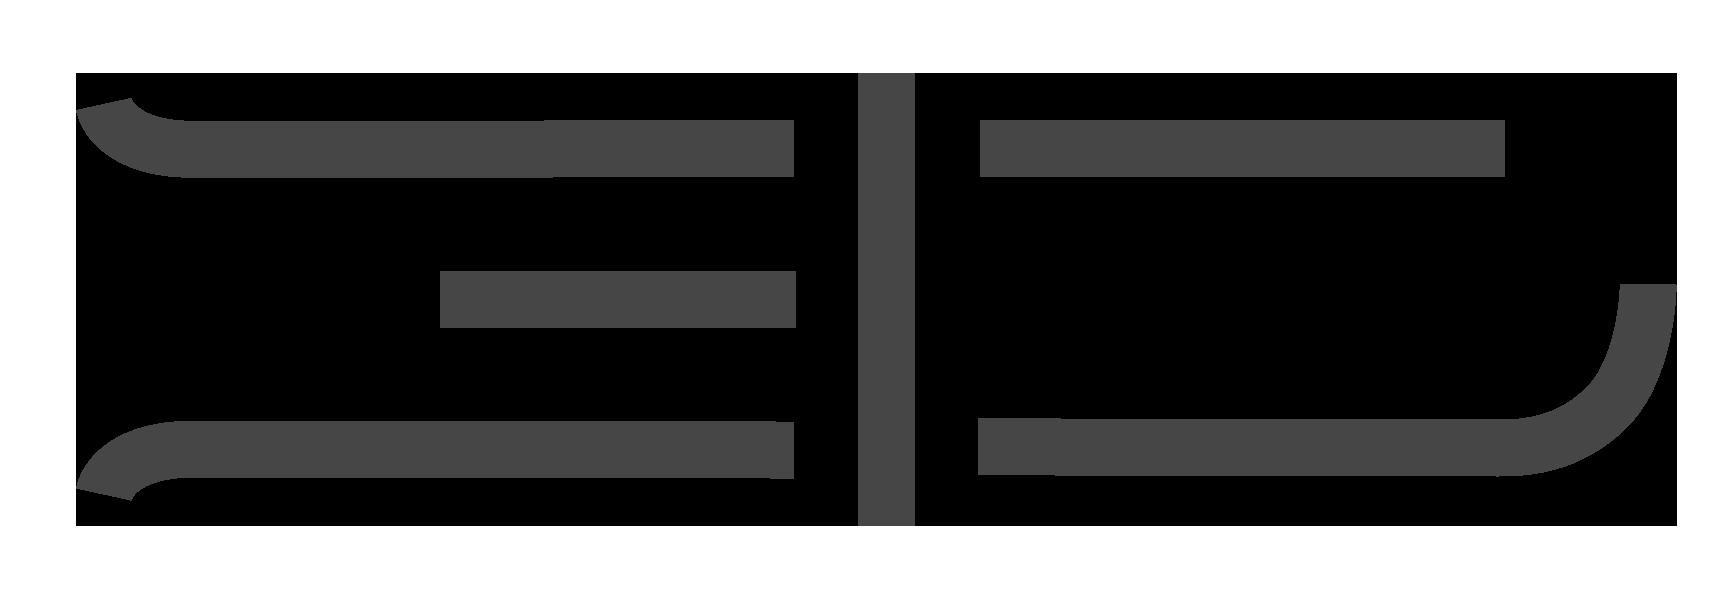 Will Krüger logo